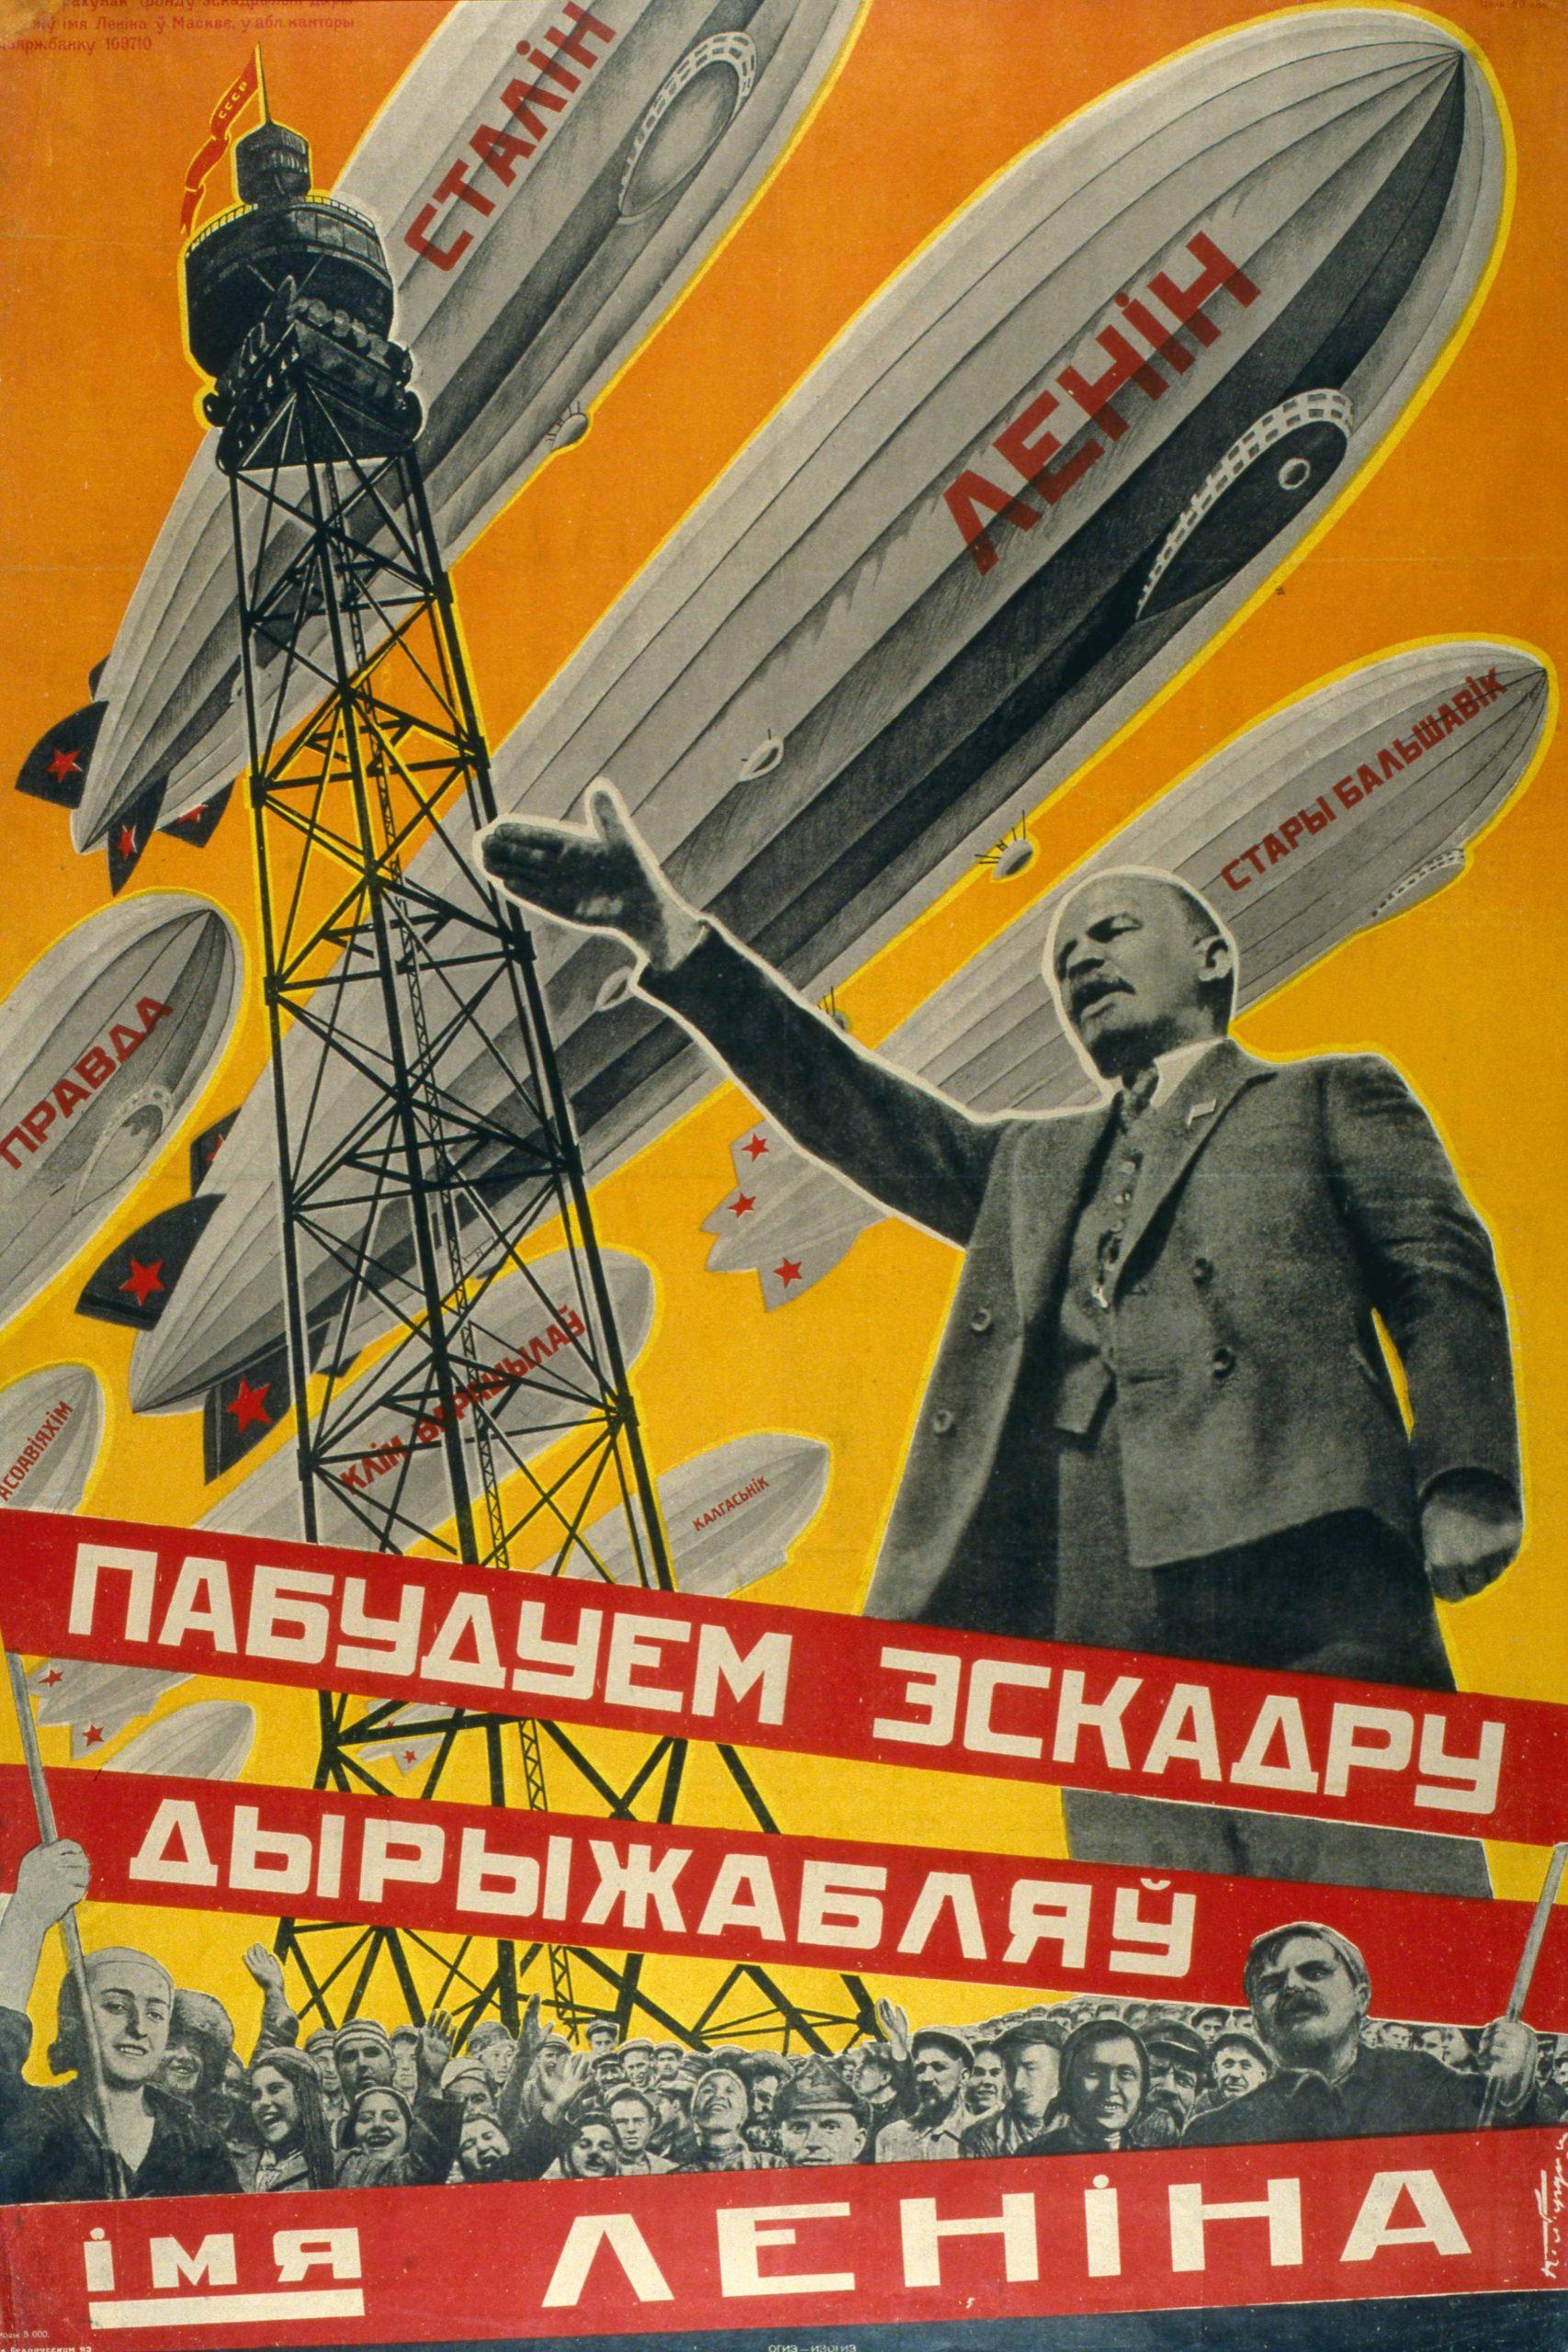 Плакат «Построим эскадру дирижаблей имени Ленина!»